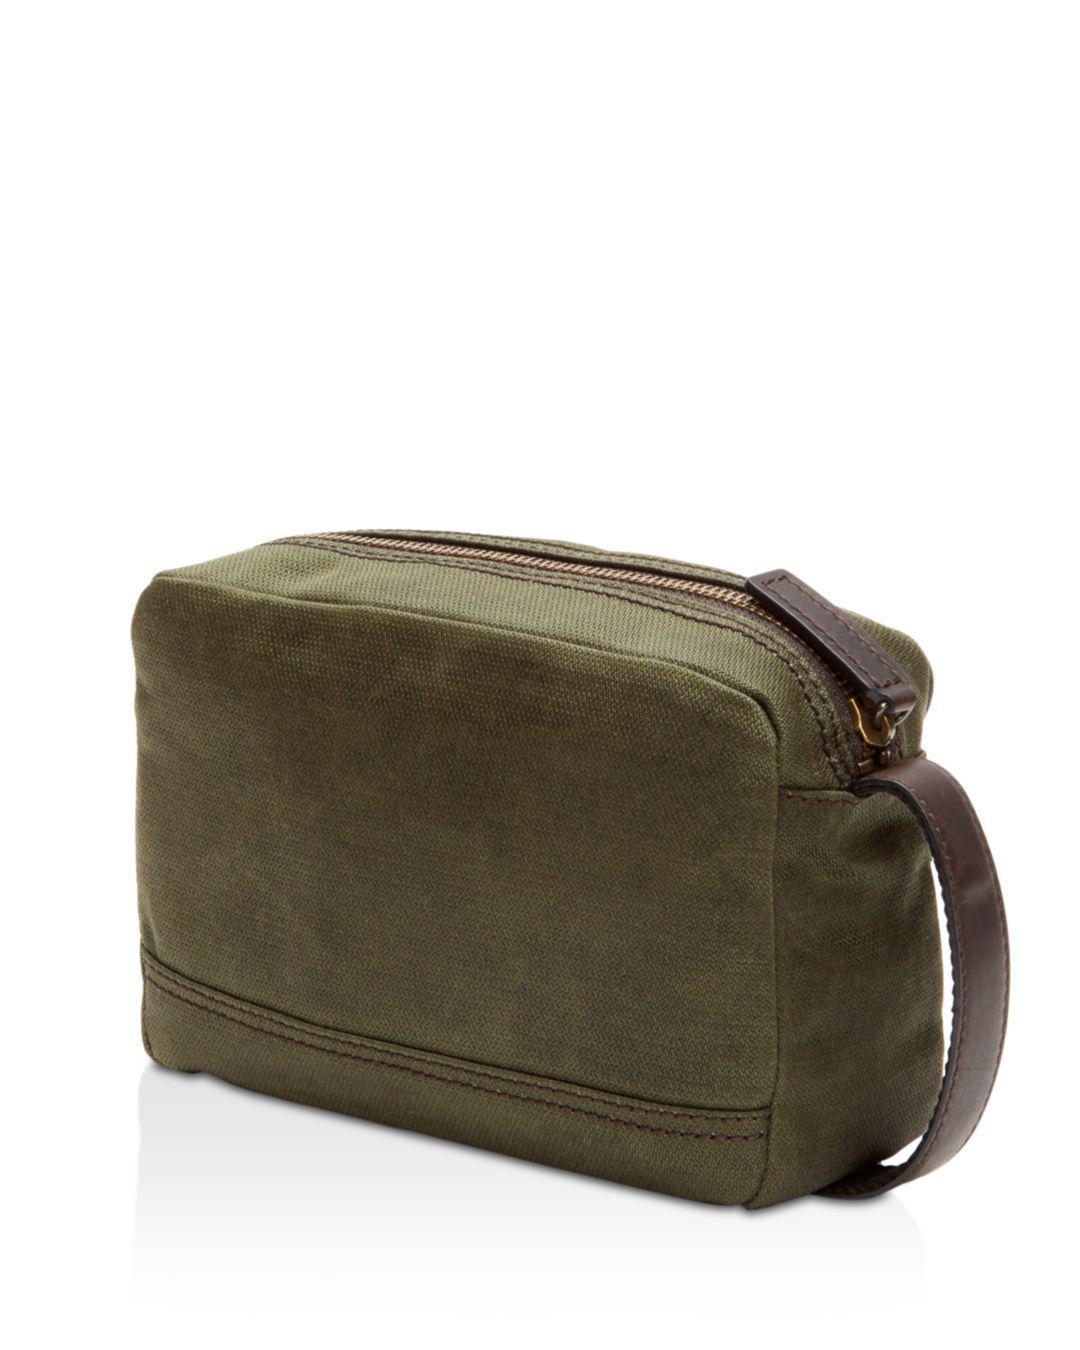 31e175ae5d Lyst - Frye Carter Slim Toiletry Bag in Green